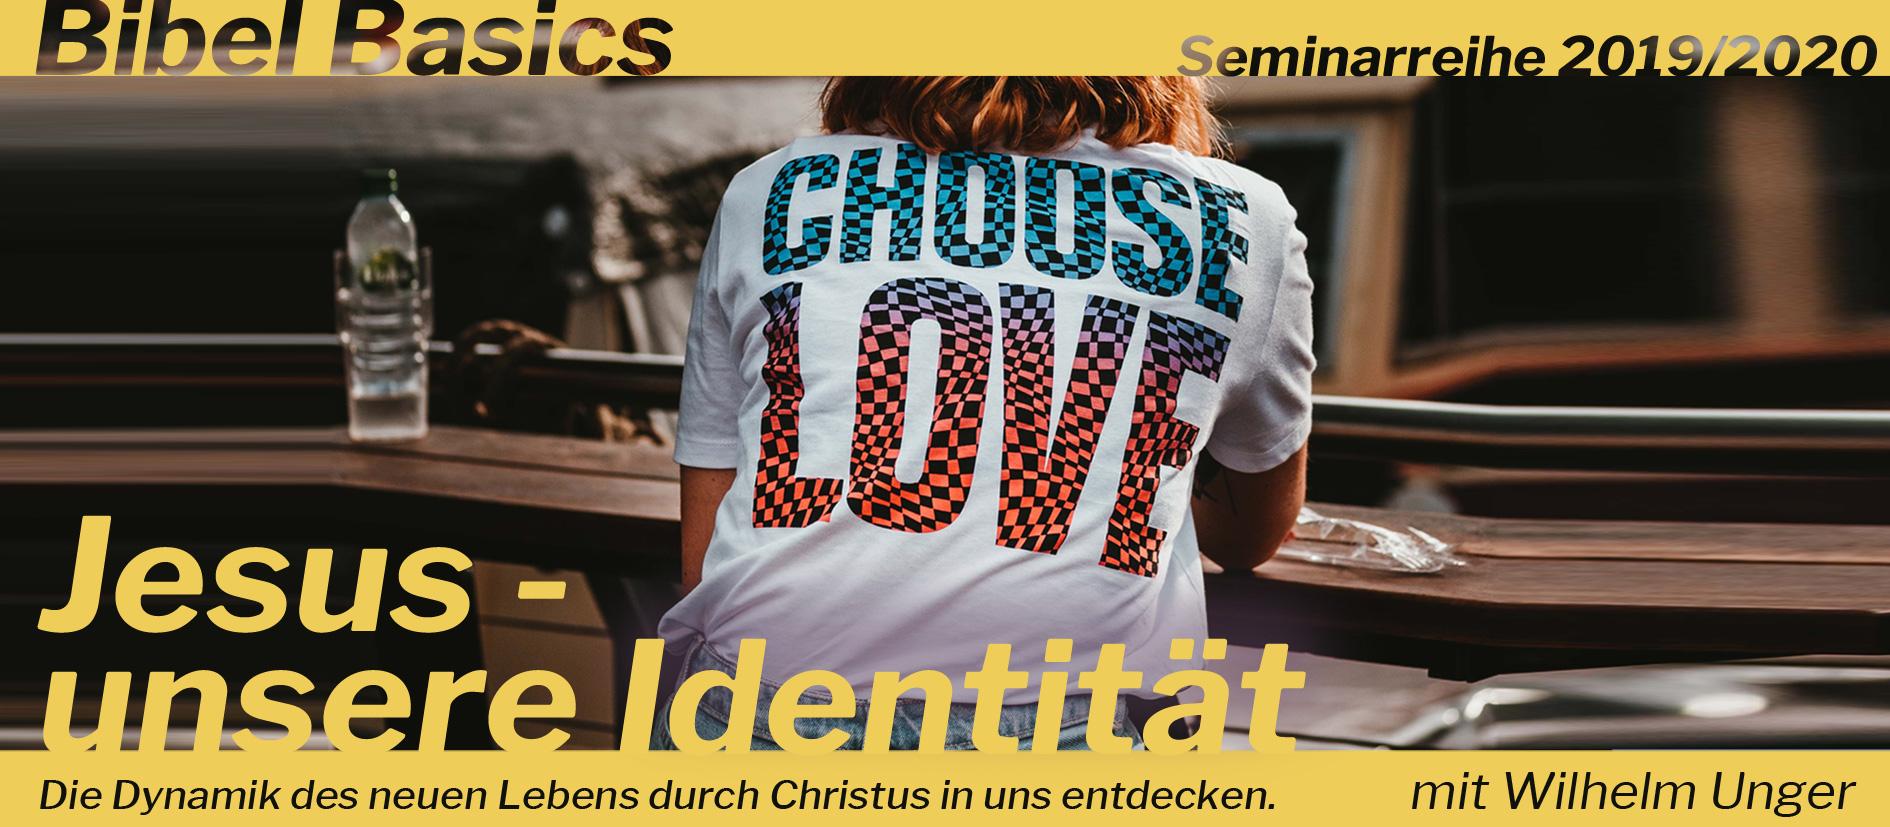 https://www.ev-freikirche-landau.de/wp-content/uploads/2019/04/BibelBasics_Identität.jpg